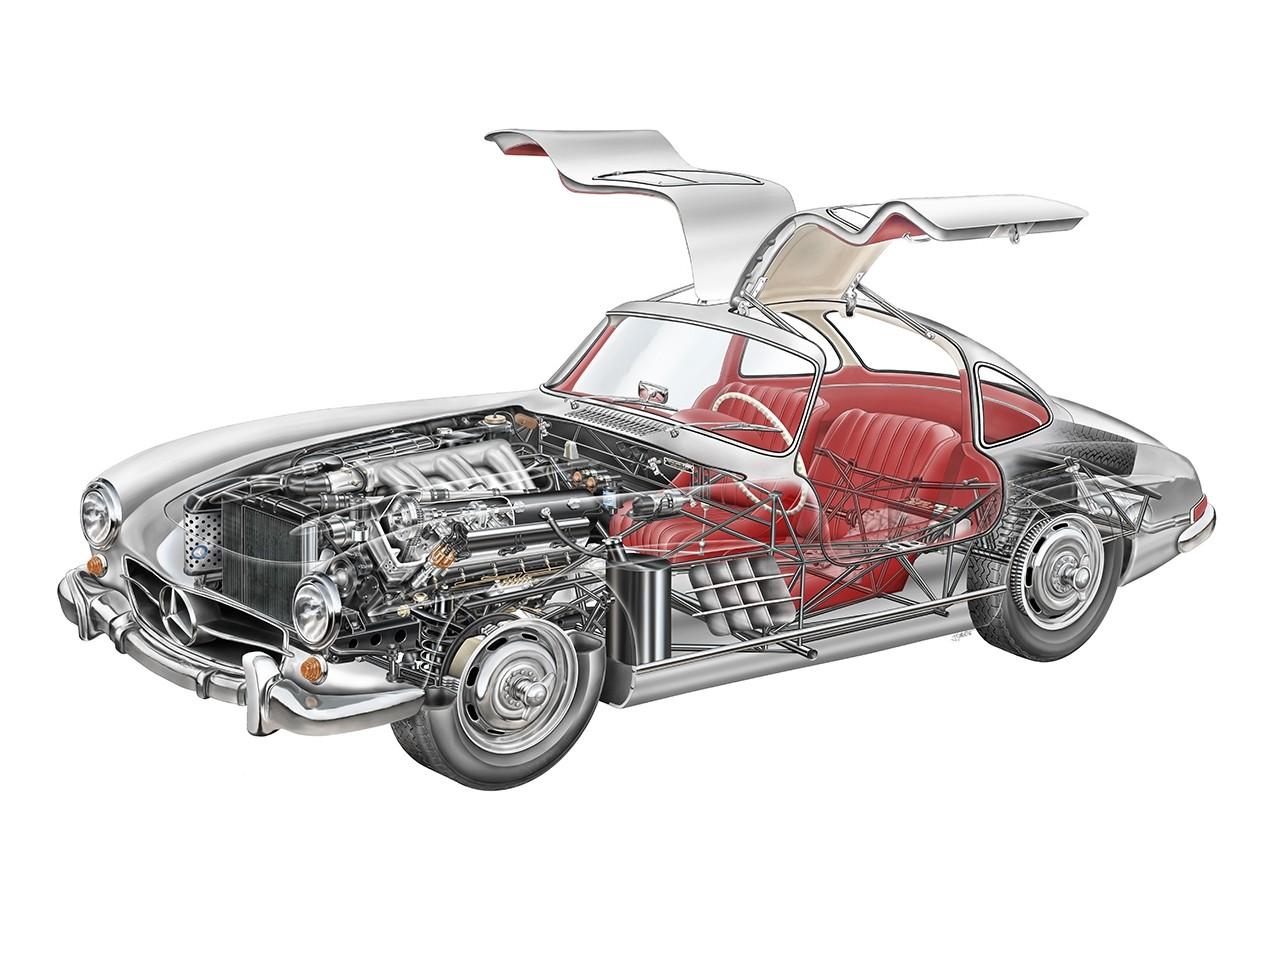 1954 Mercedes-Benz 300SL Gullwing W198